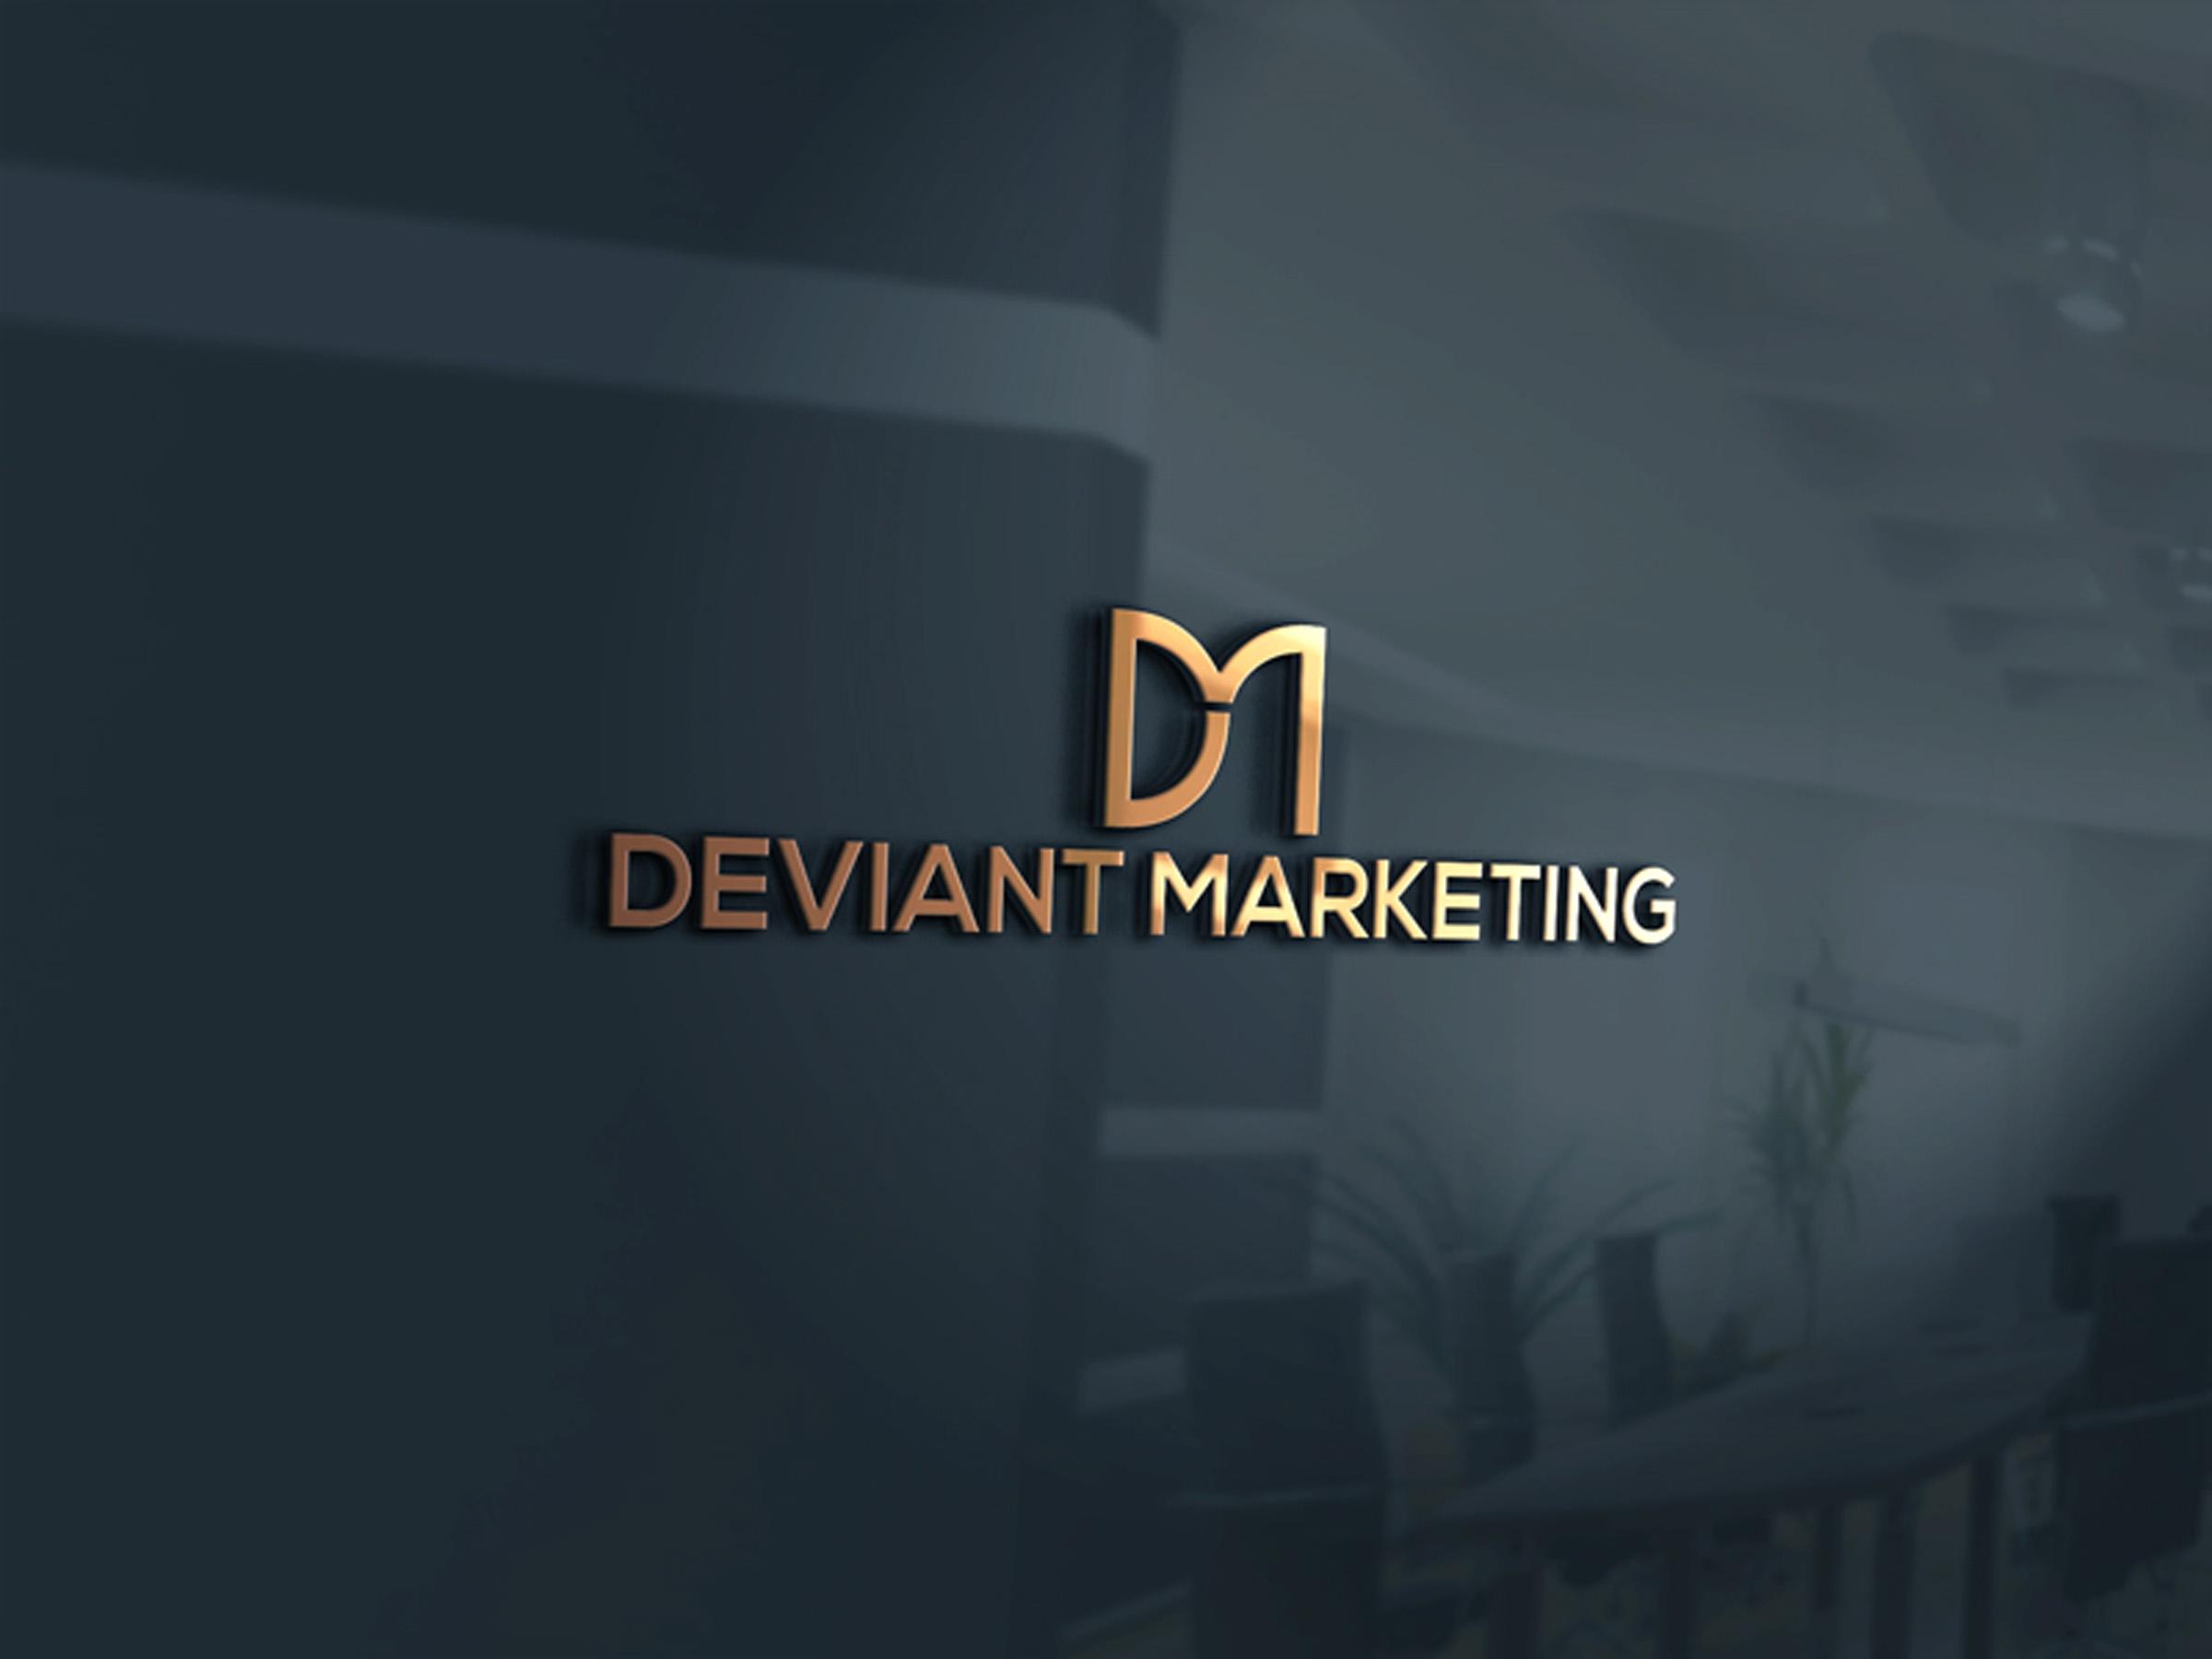 Deviant Marketing 3 3400